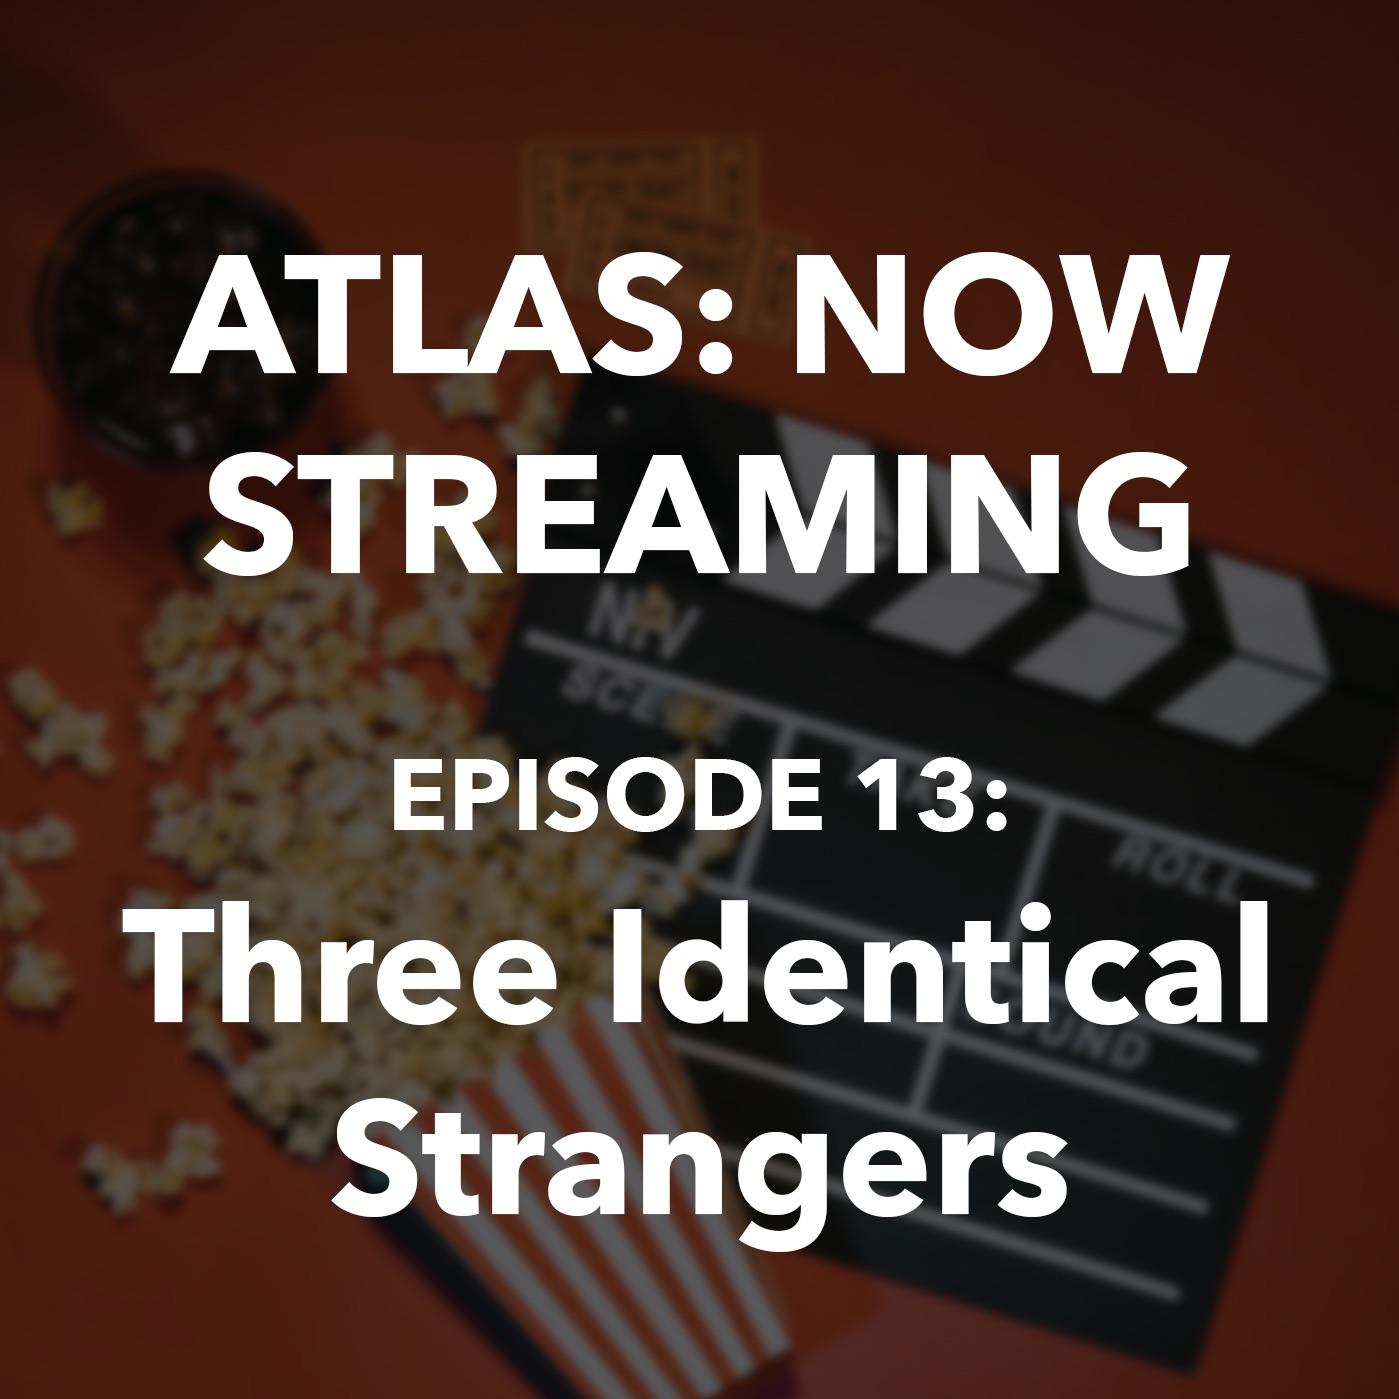 Atlas: Now Streaming Episode 13 - Three Identical Strangers